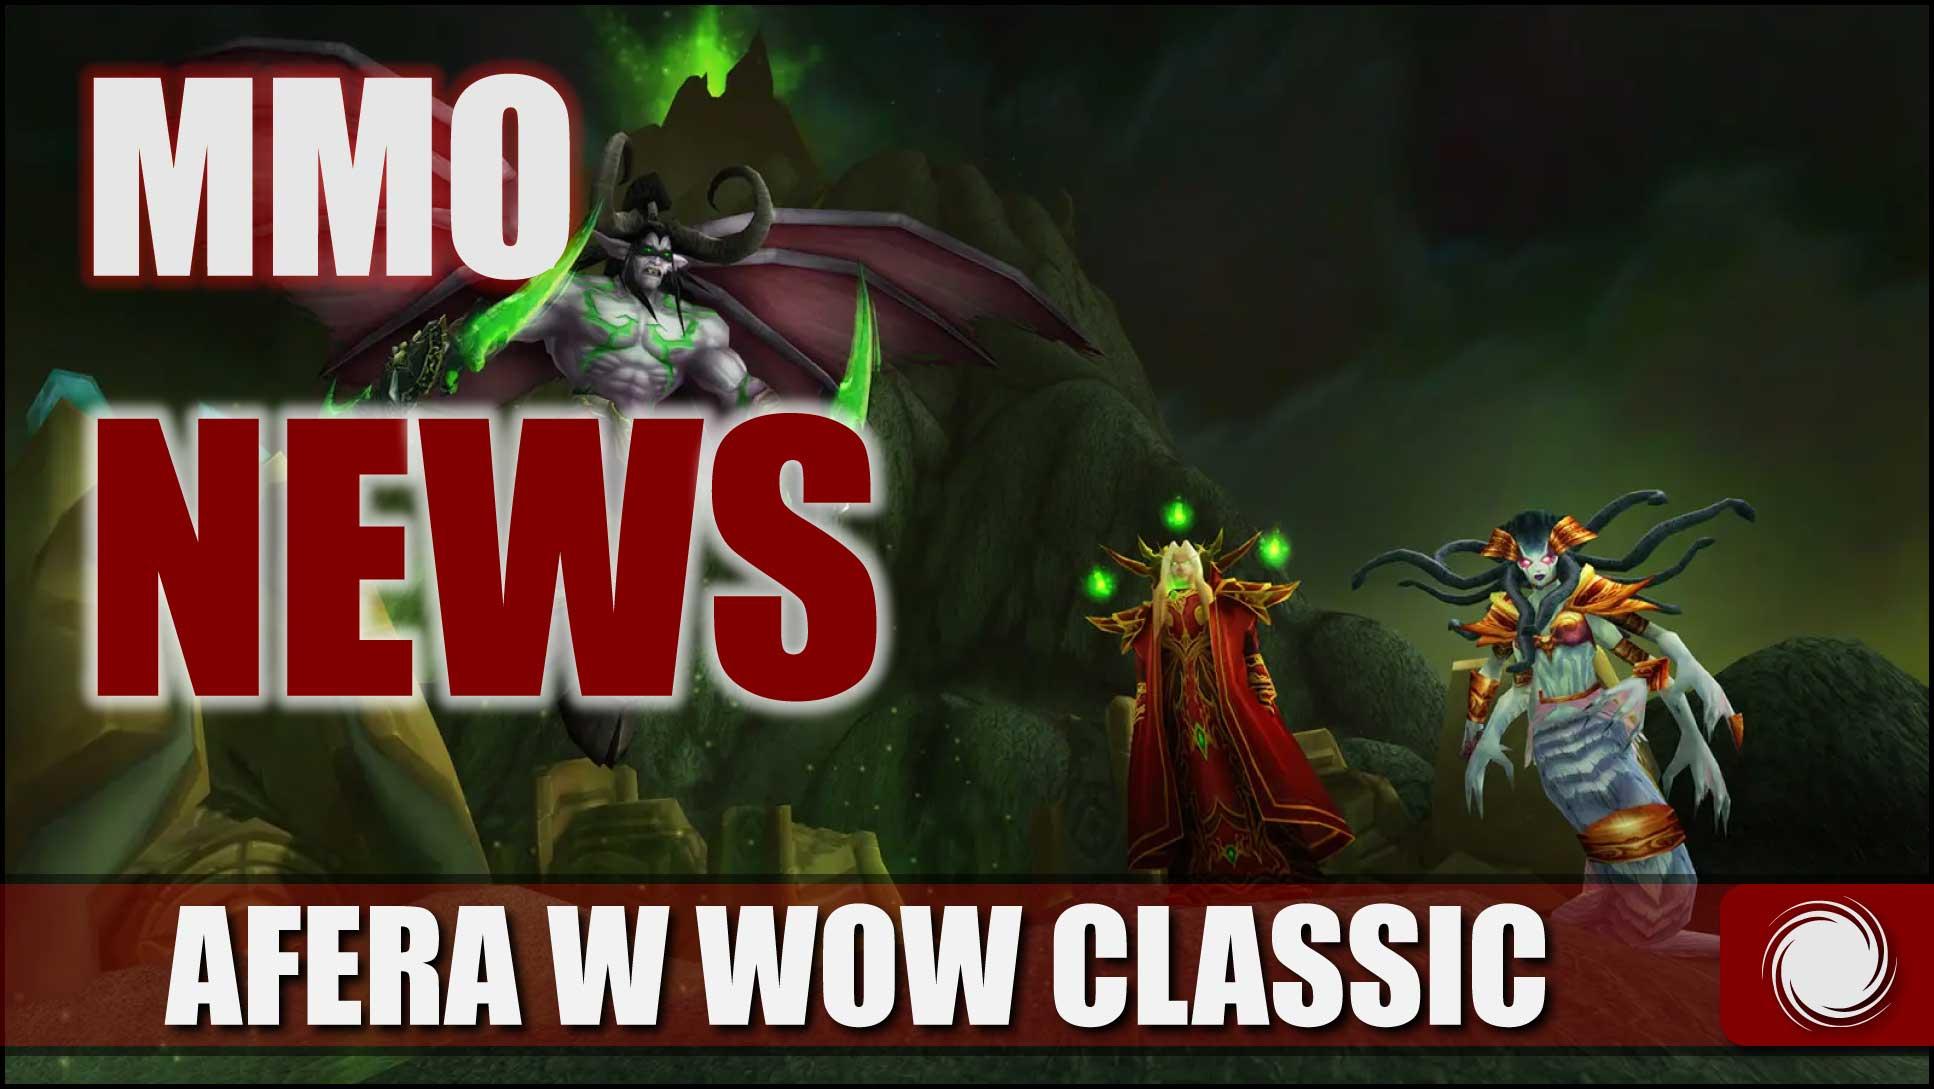 MMO News 2021 Afera wWoW Classic